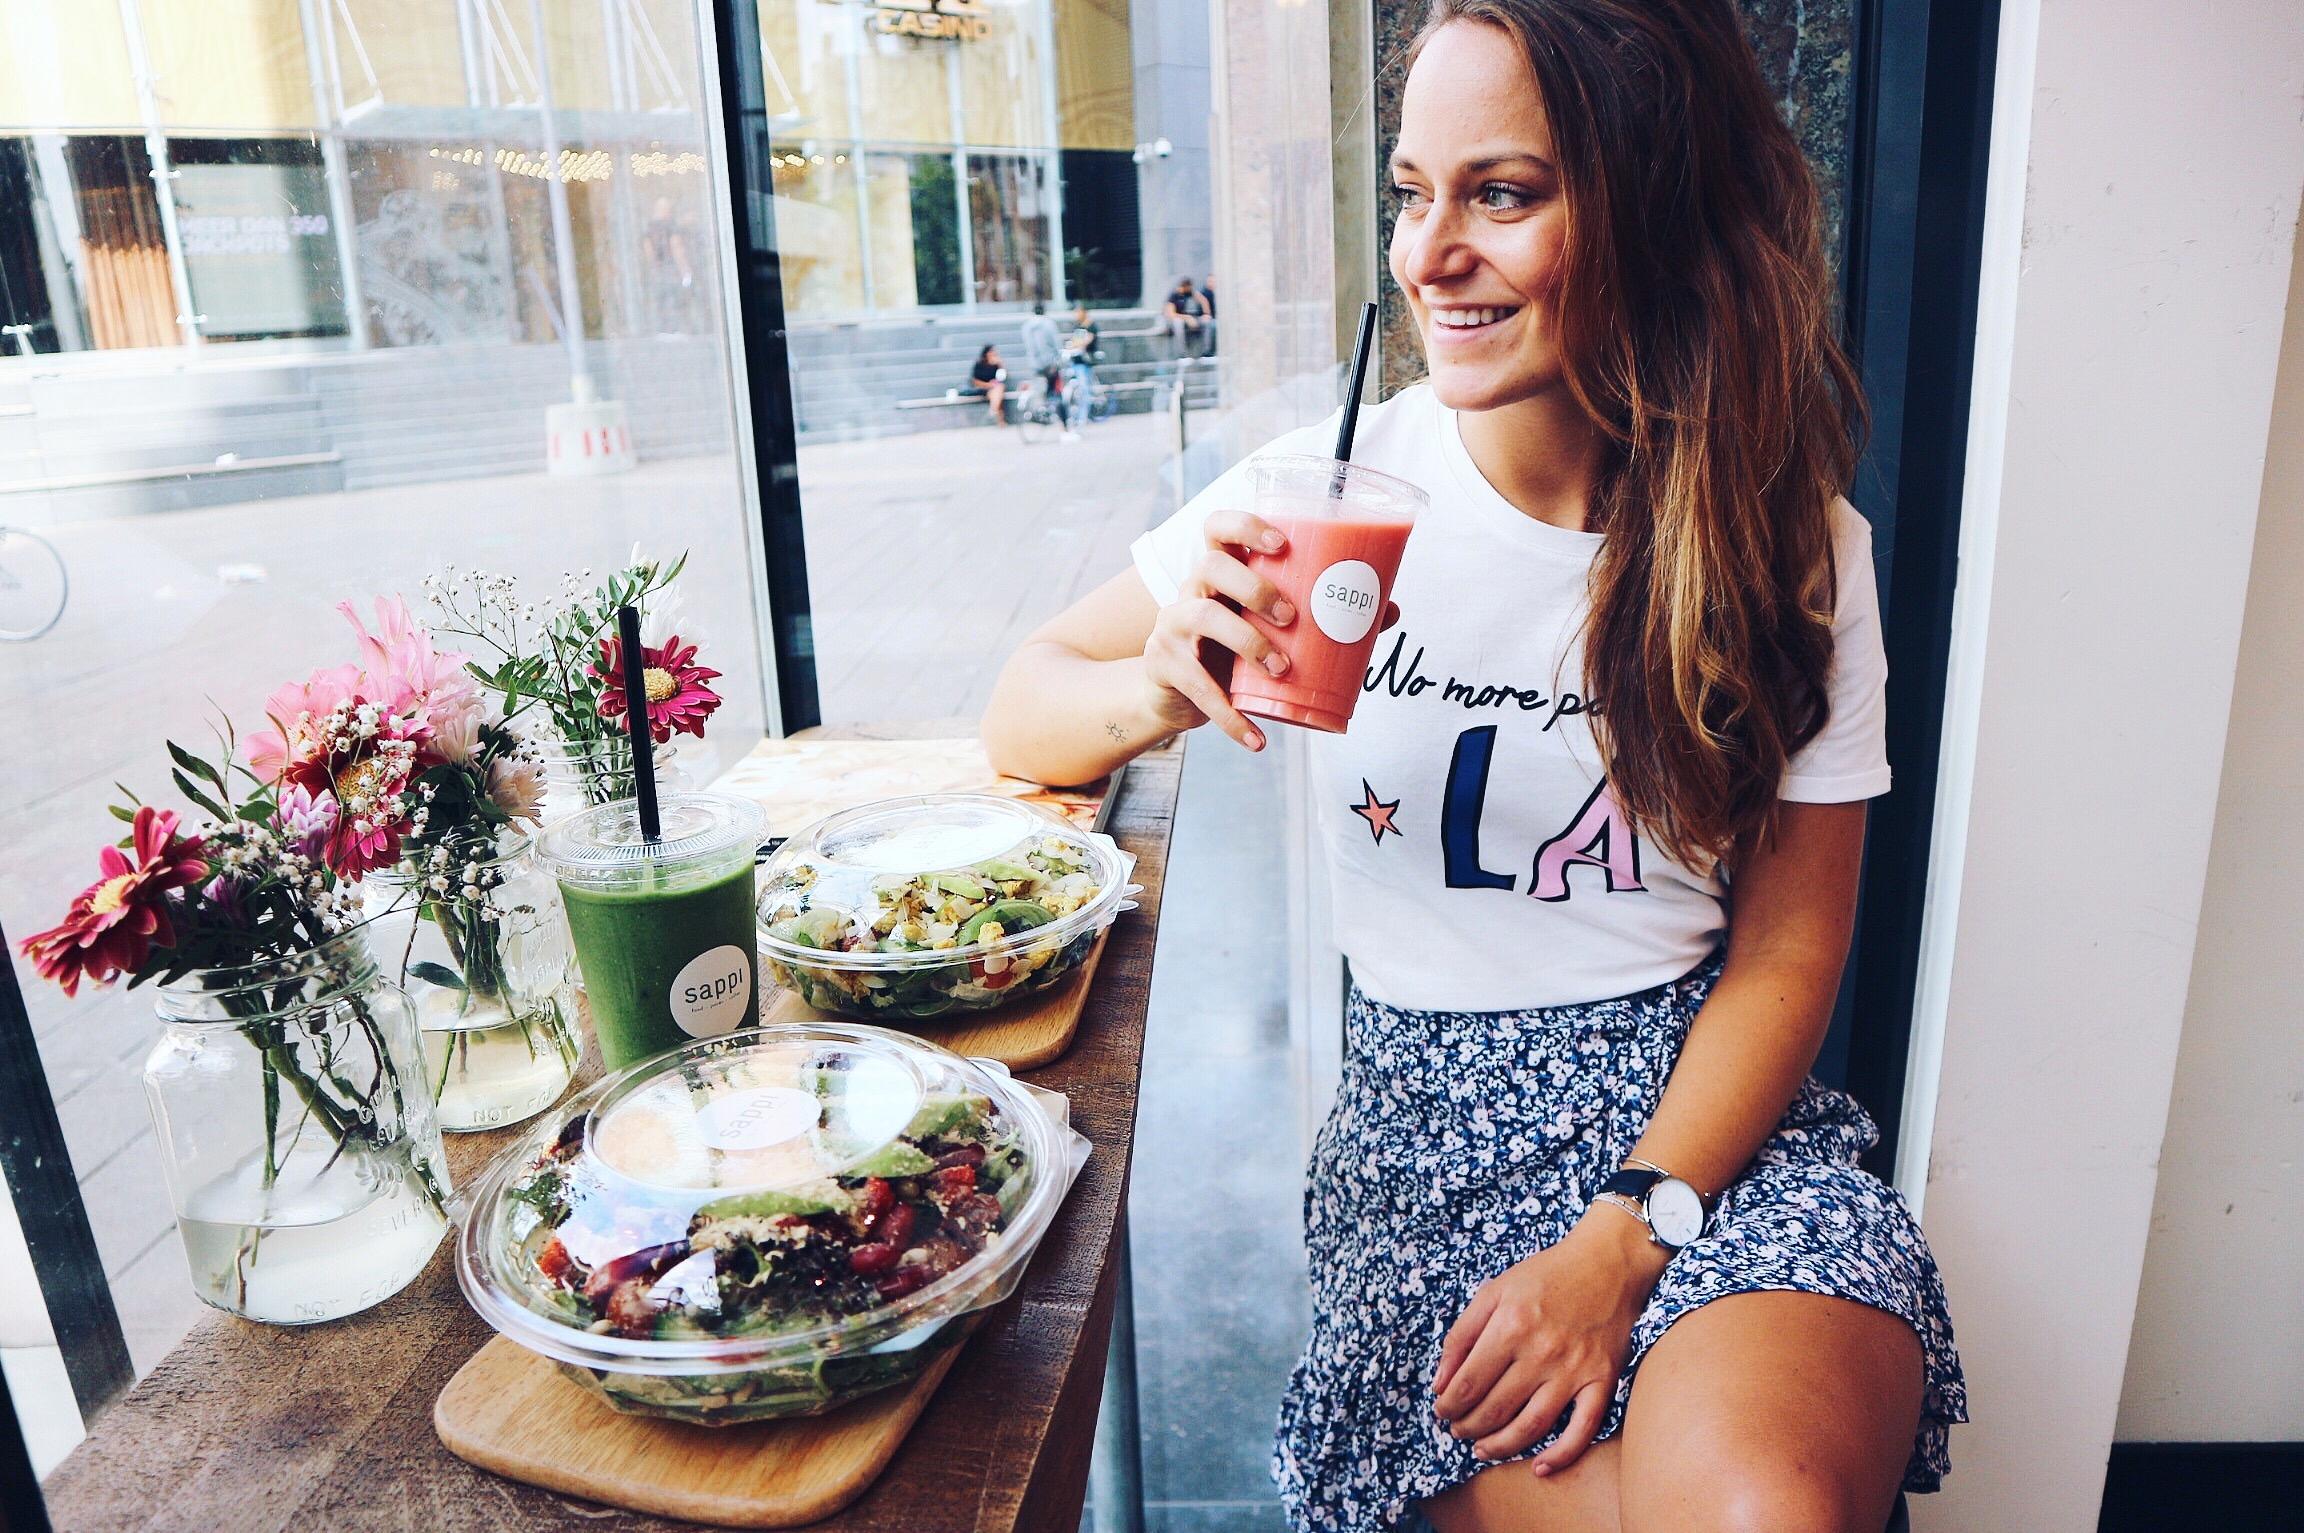 rotterdam, blog, blogger, xmariekie, sue, suefood, suefoodrotterdam, sappi, hotspot, hotspots, hotspotrotterdam, sappirotterdam, sajoer, sajoerrotterdam, food, foodie, smoothie, juice, vegan